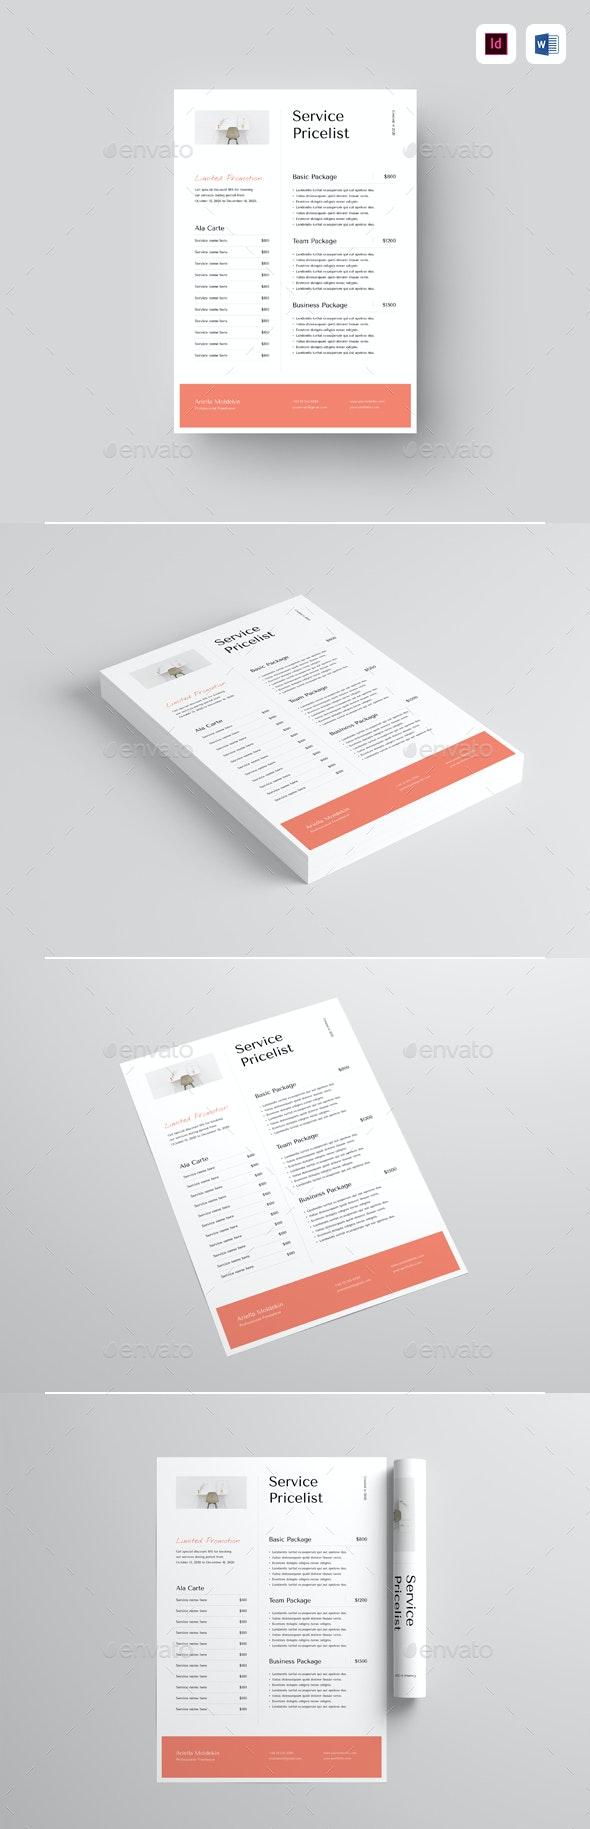 Service Pricelist - Corporate Flyers